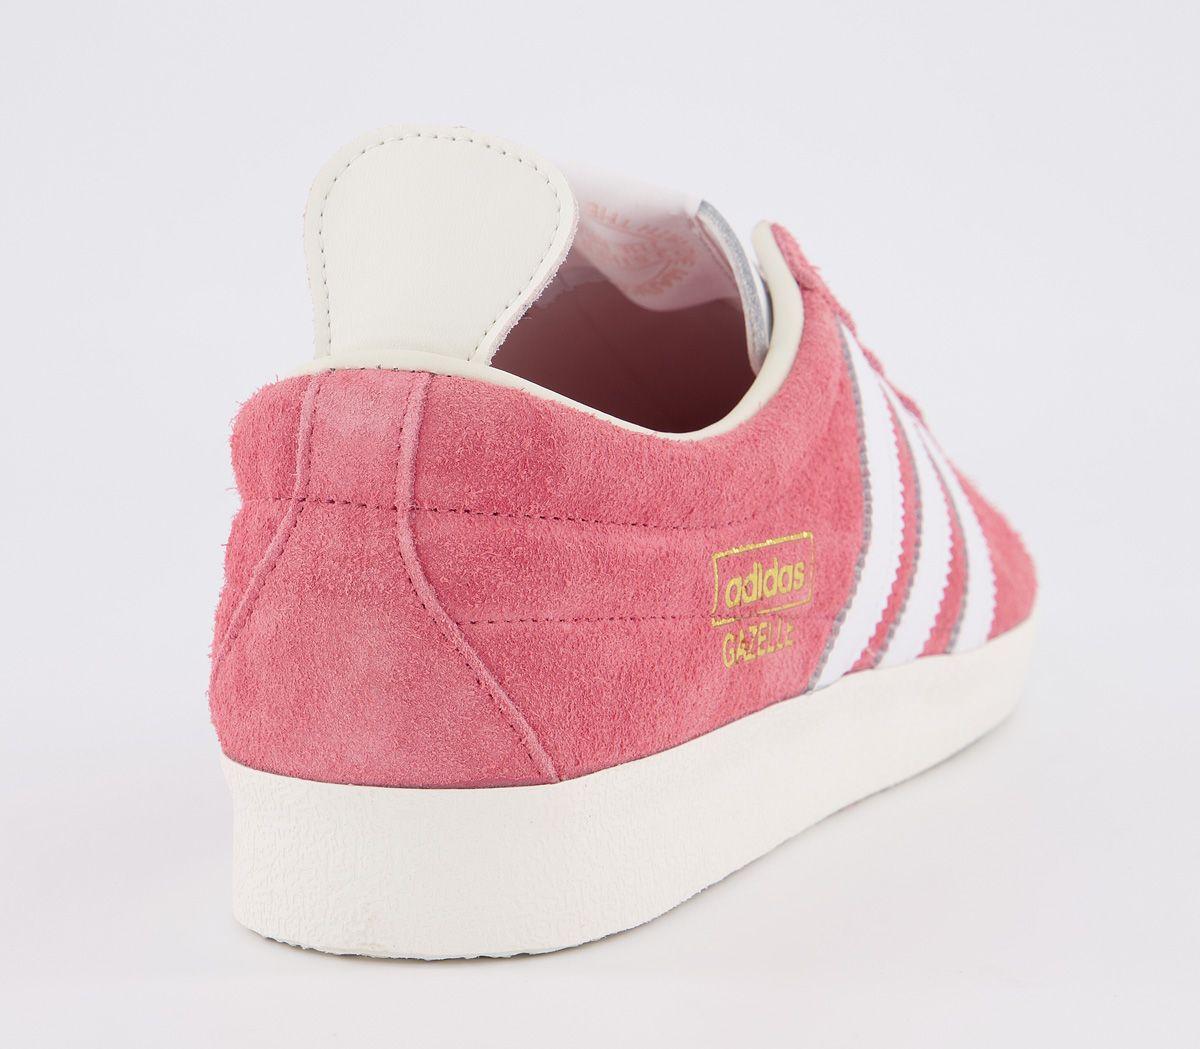 Adidas-Gazelle-Vintage-Baskets-Real-Rose-Blanc-Blanc-Baskets-Chaussures miniature 4